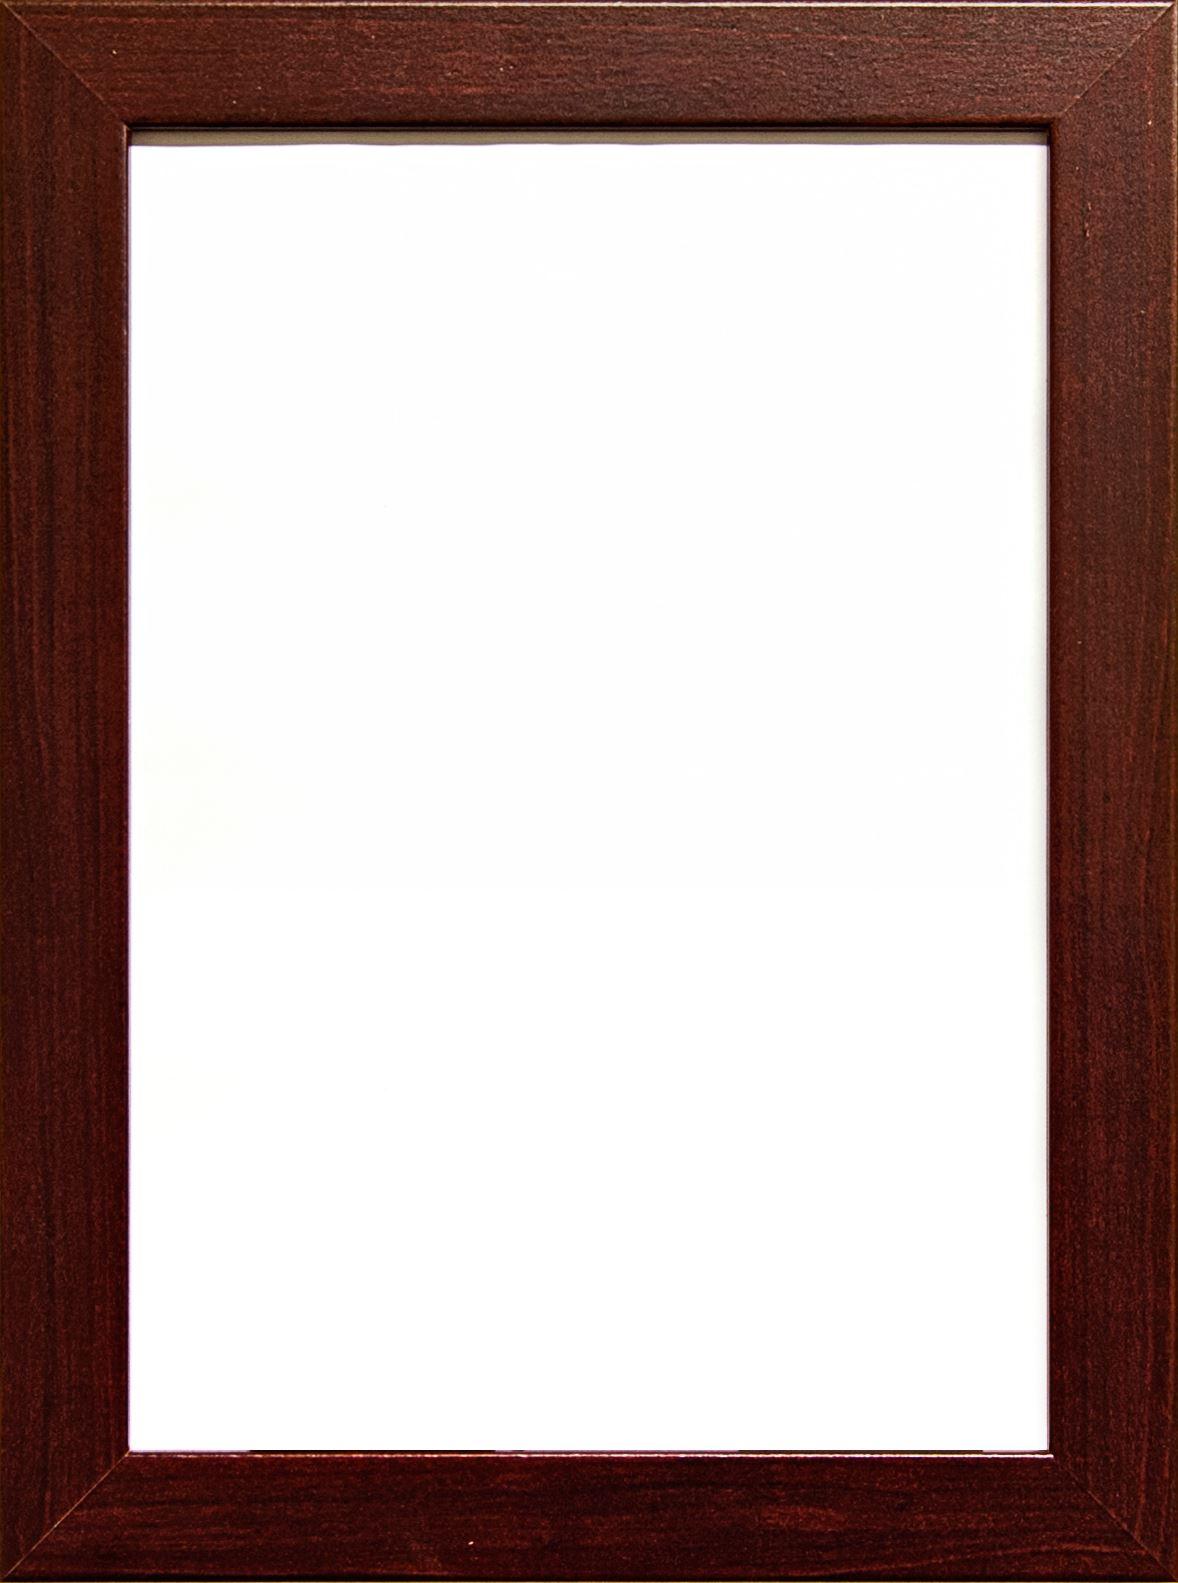 photo frame picture poster frame black white pine - Wooden Poster Frames